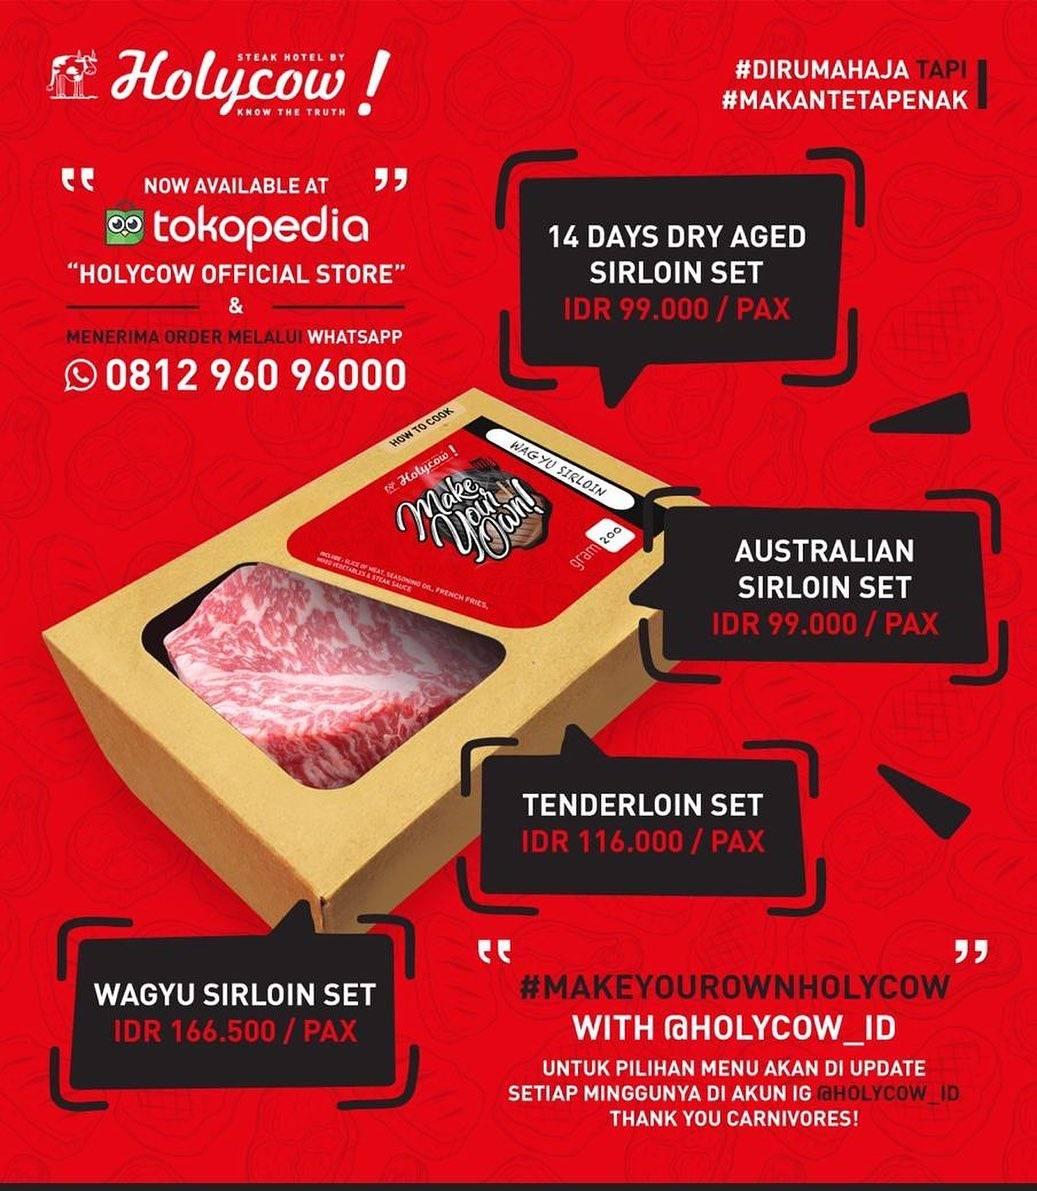 Diskon HolyCow Promo Paket Make Your Own HolyCow Harga Mulai Dari Rp. 99.000 Pesan Via Tokopedia